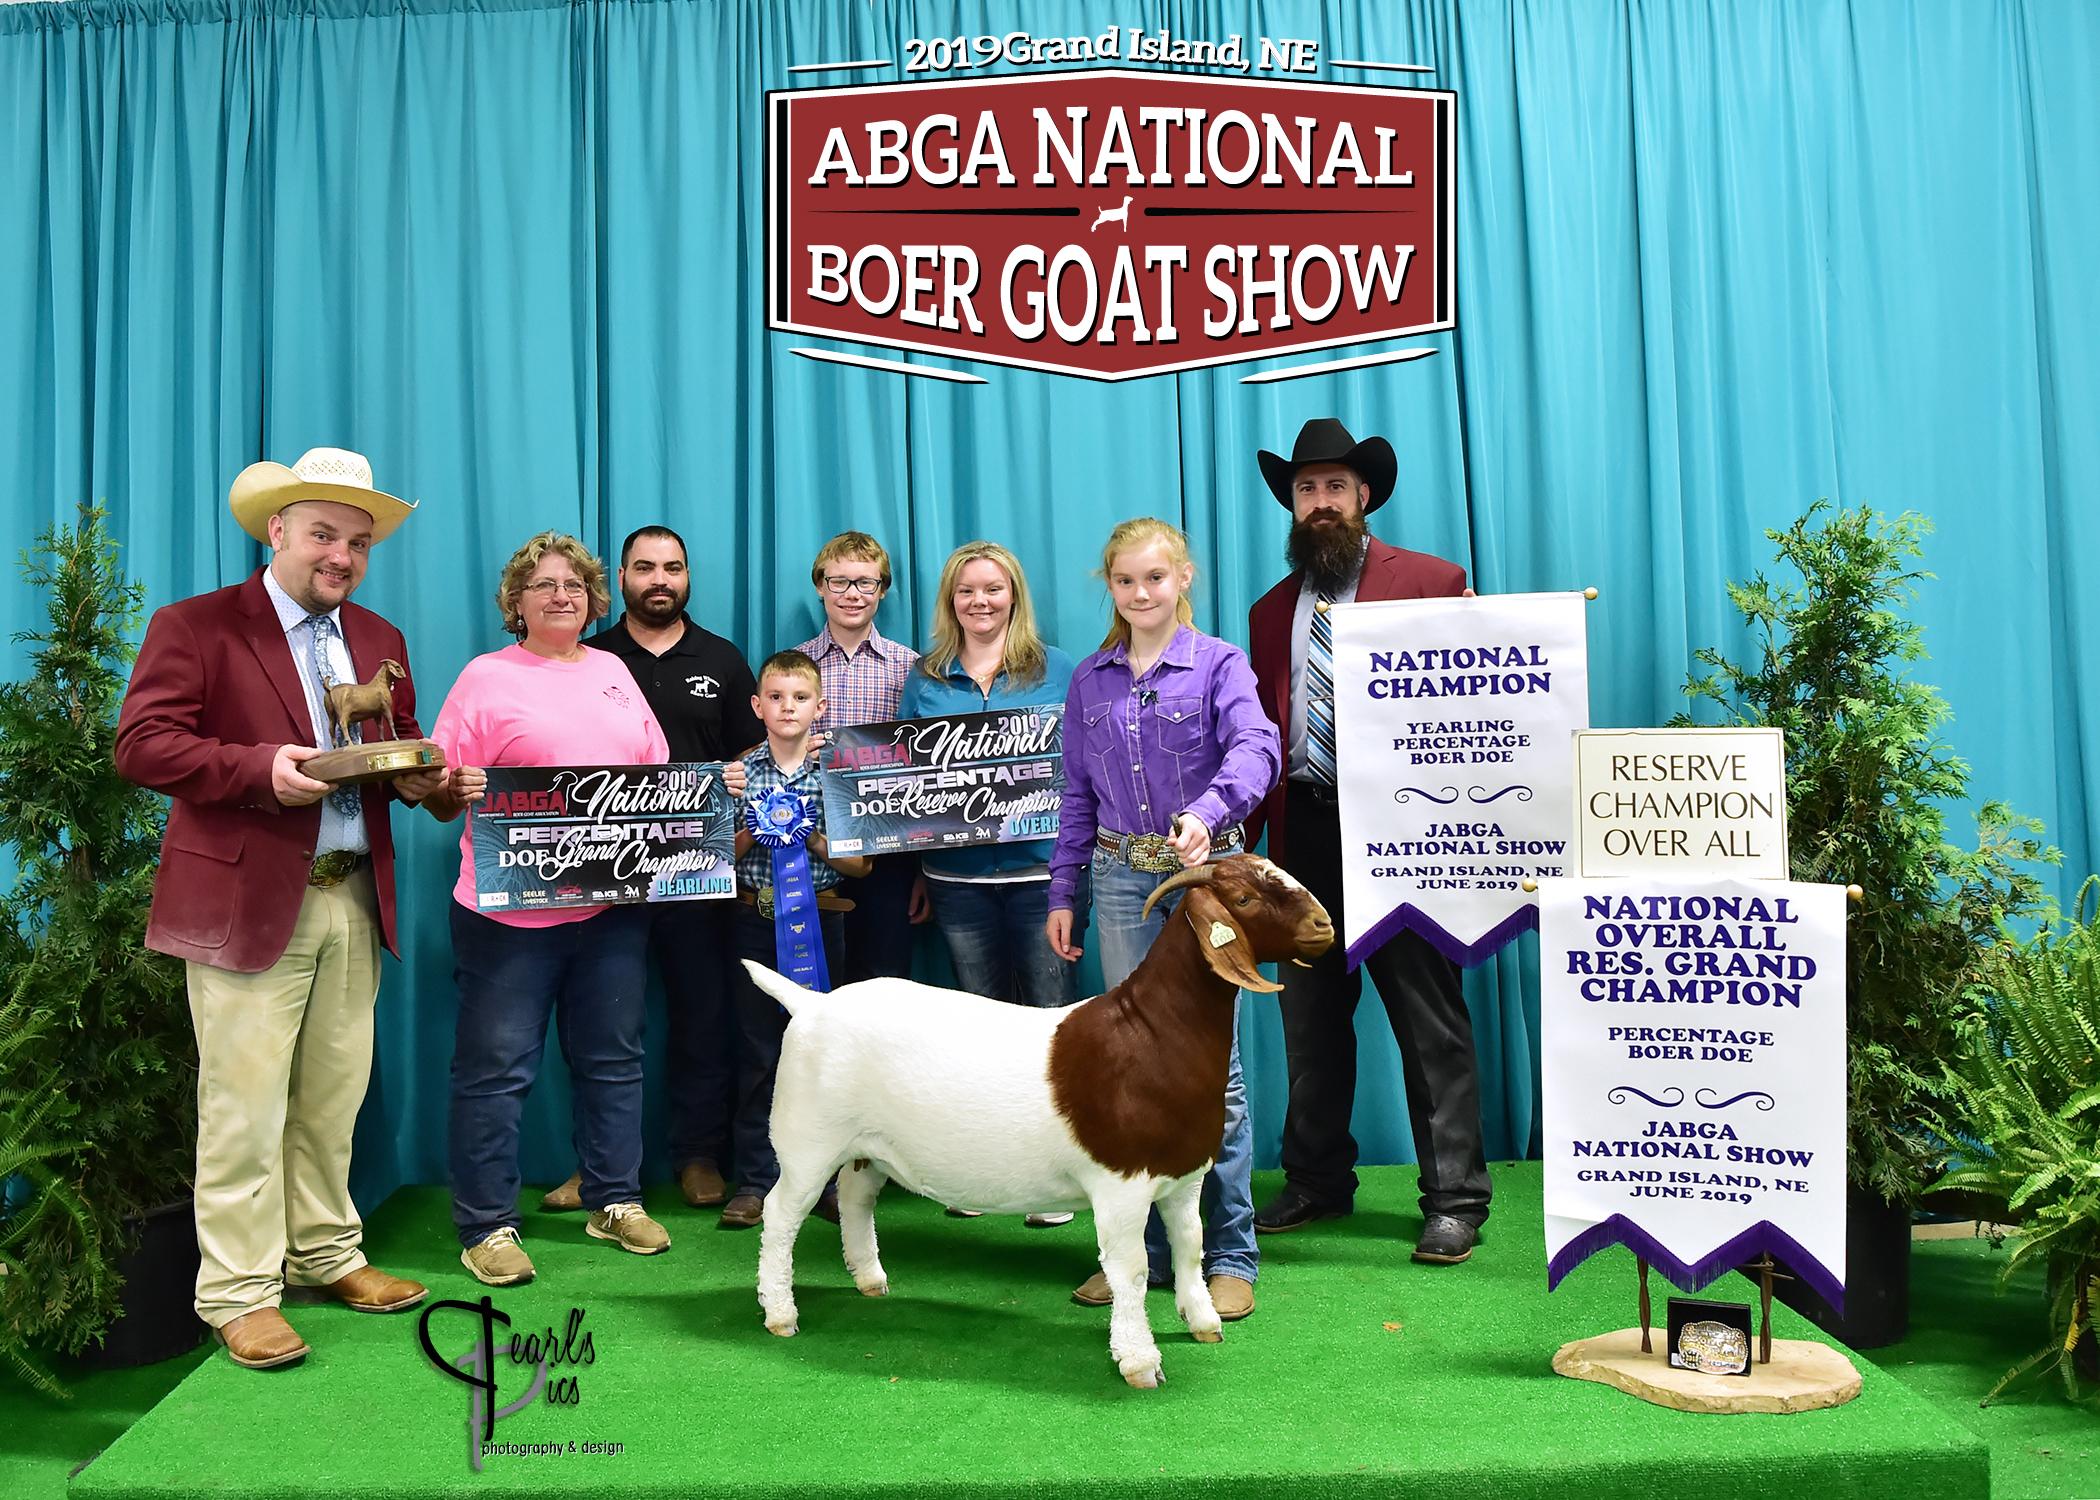 ABGA NATIONAL SHOW